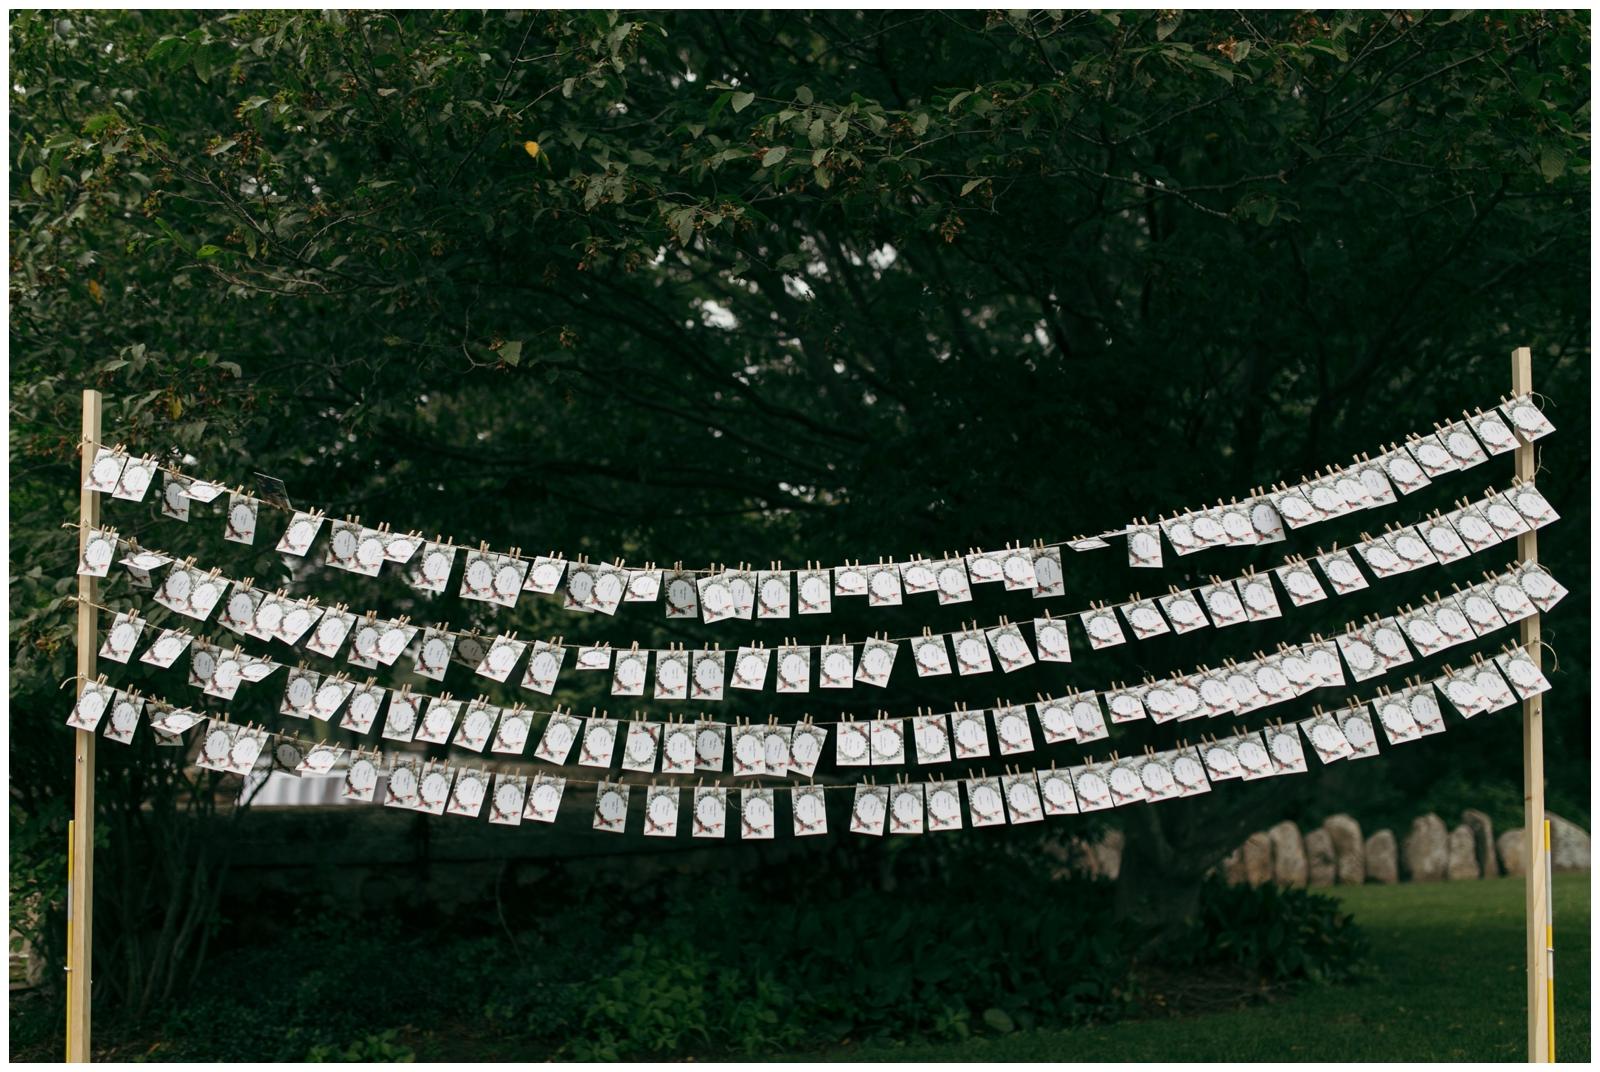 Moraine-Farm-wedding-Bailey-Q-Photo-Massachusetts-wedding-photpgrapher-097.jpg